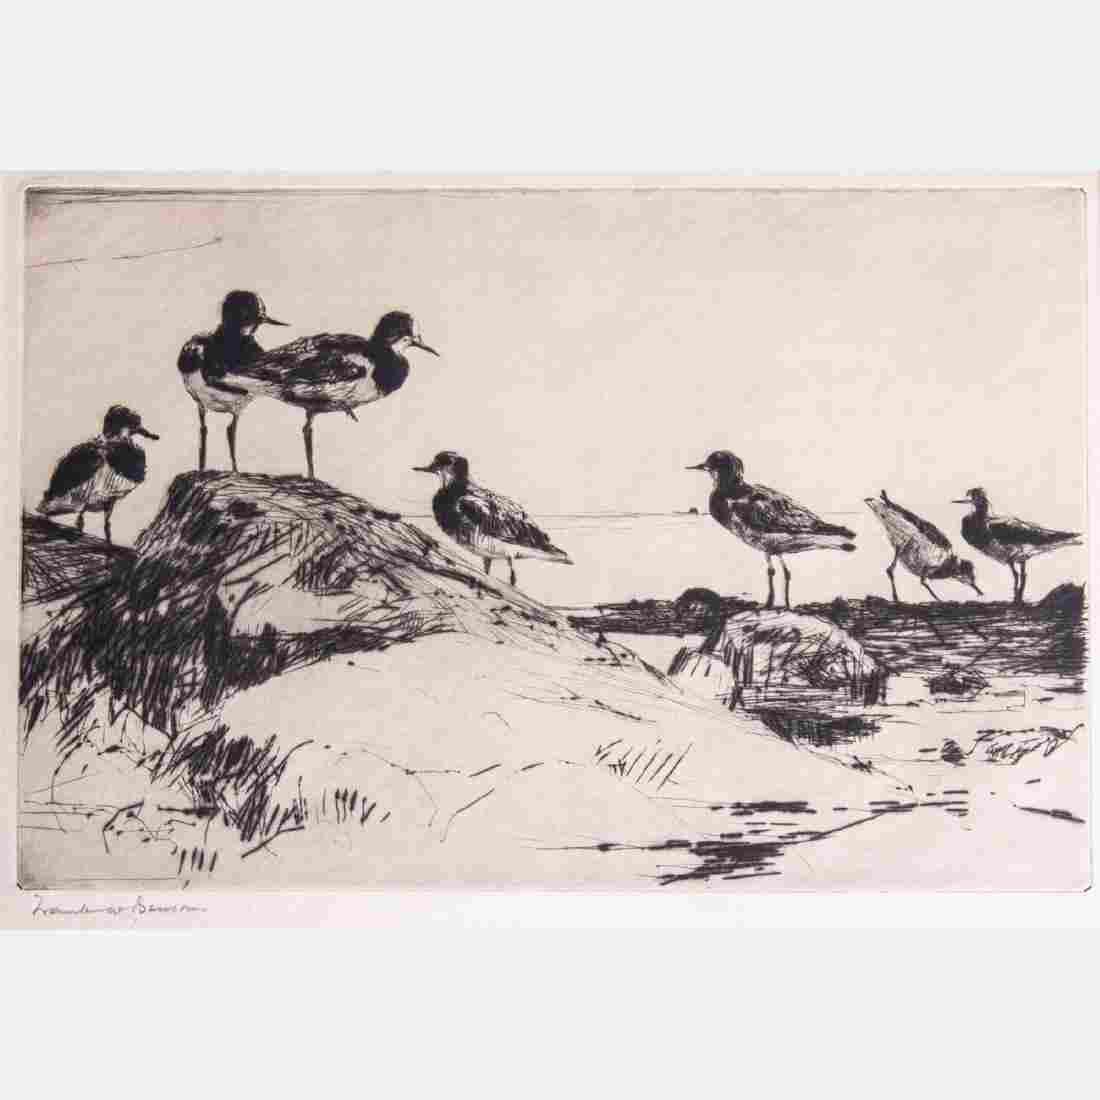 Frank Weston Benson (1862-1951) Turnstones, 1928,